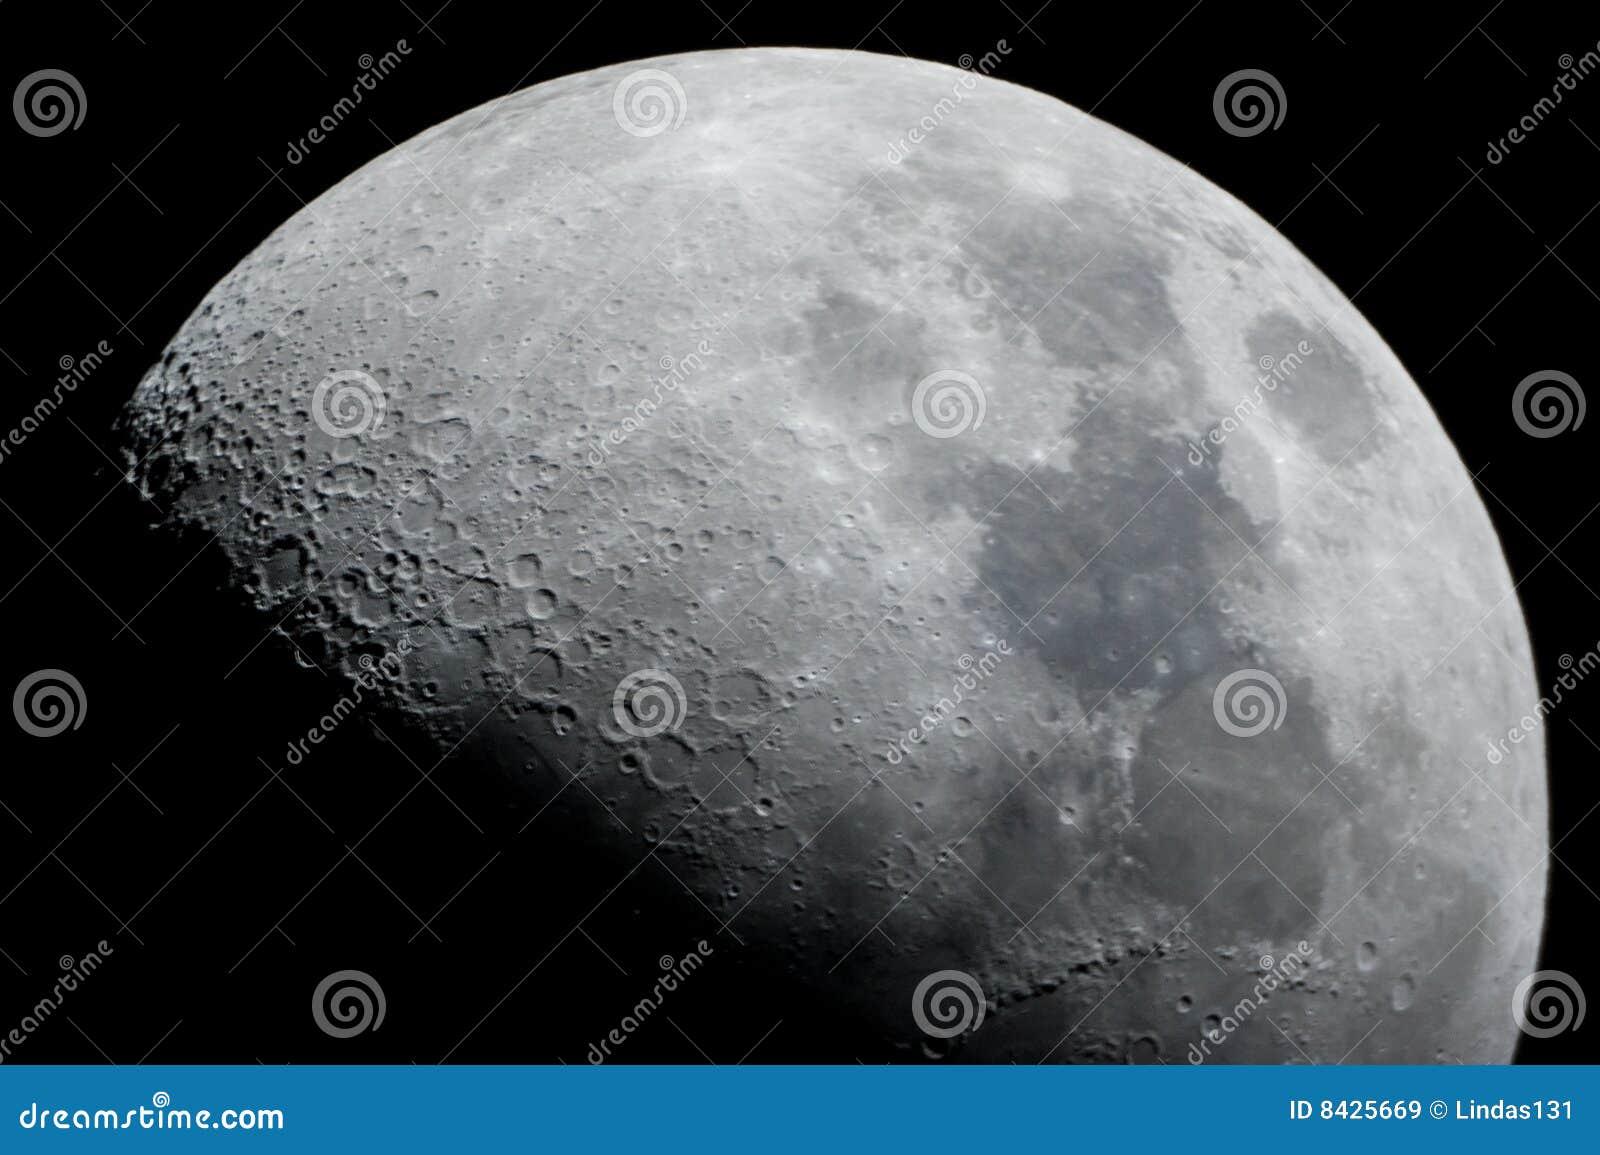 Demi de lune proche vers le haut